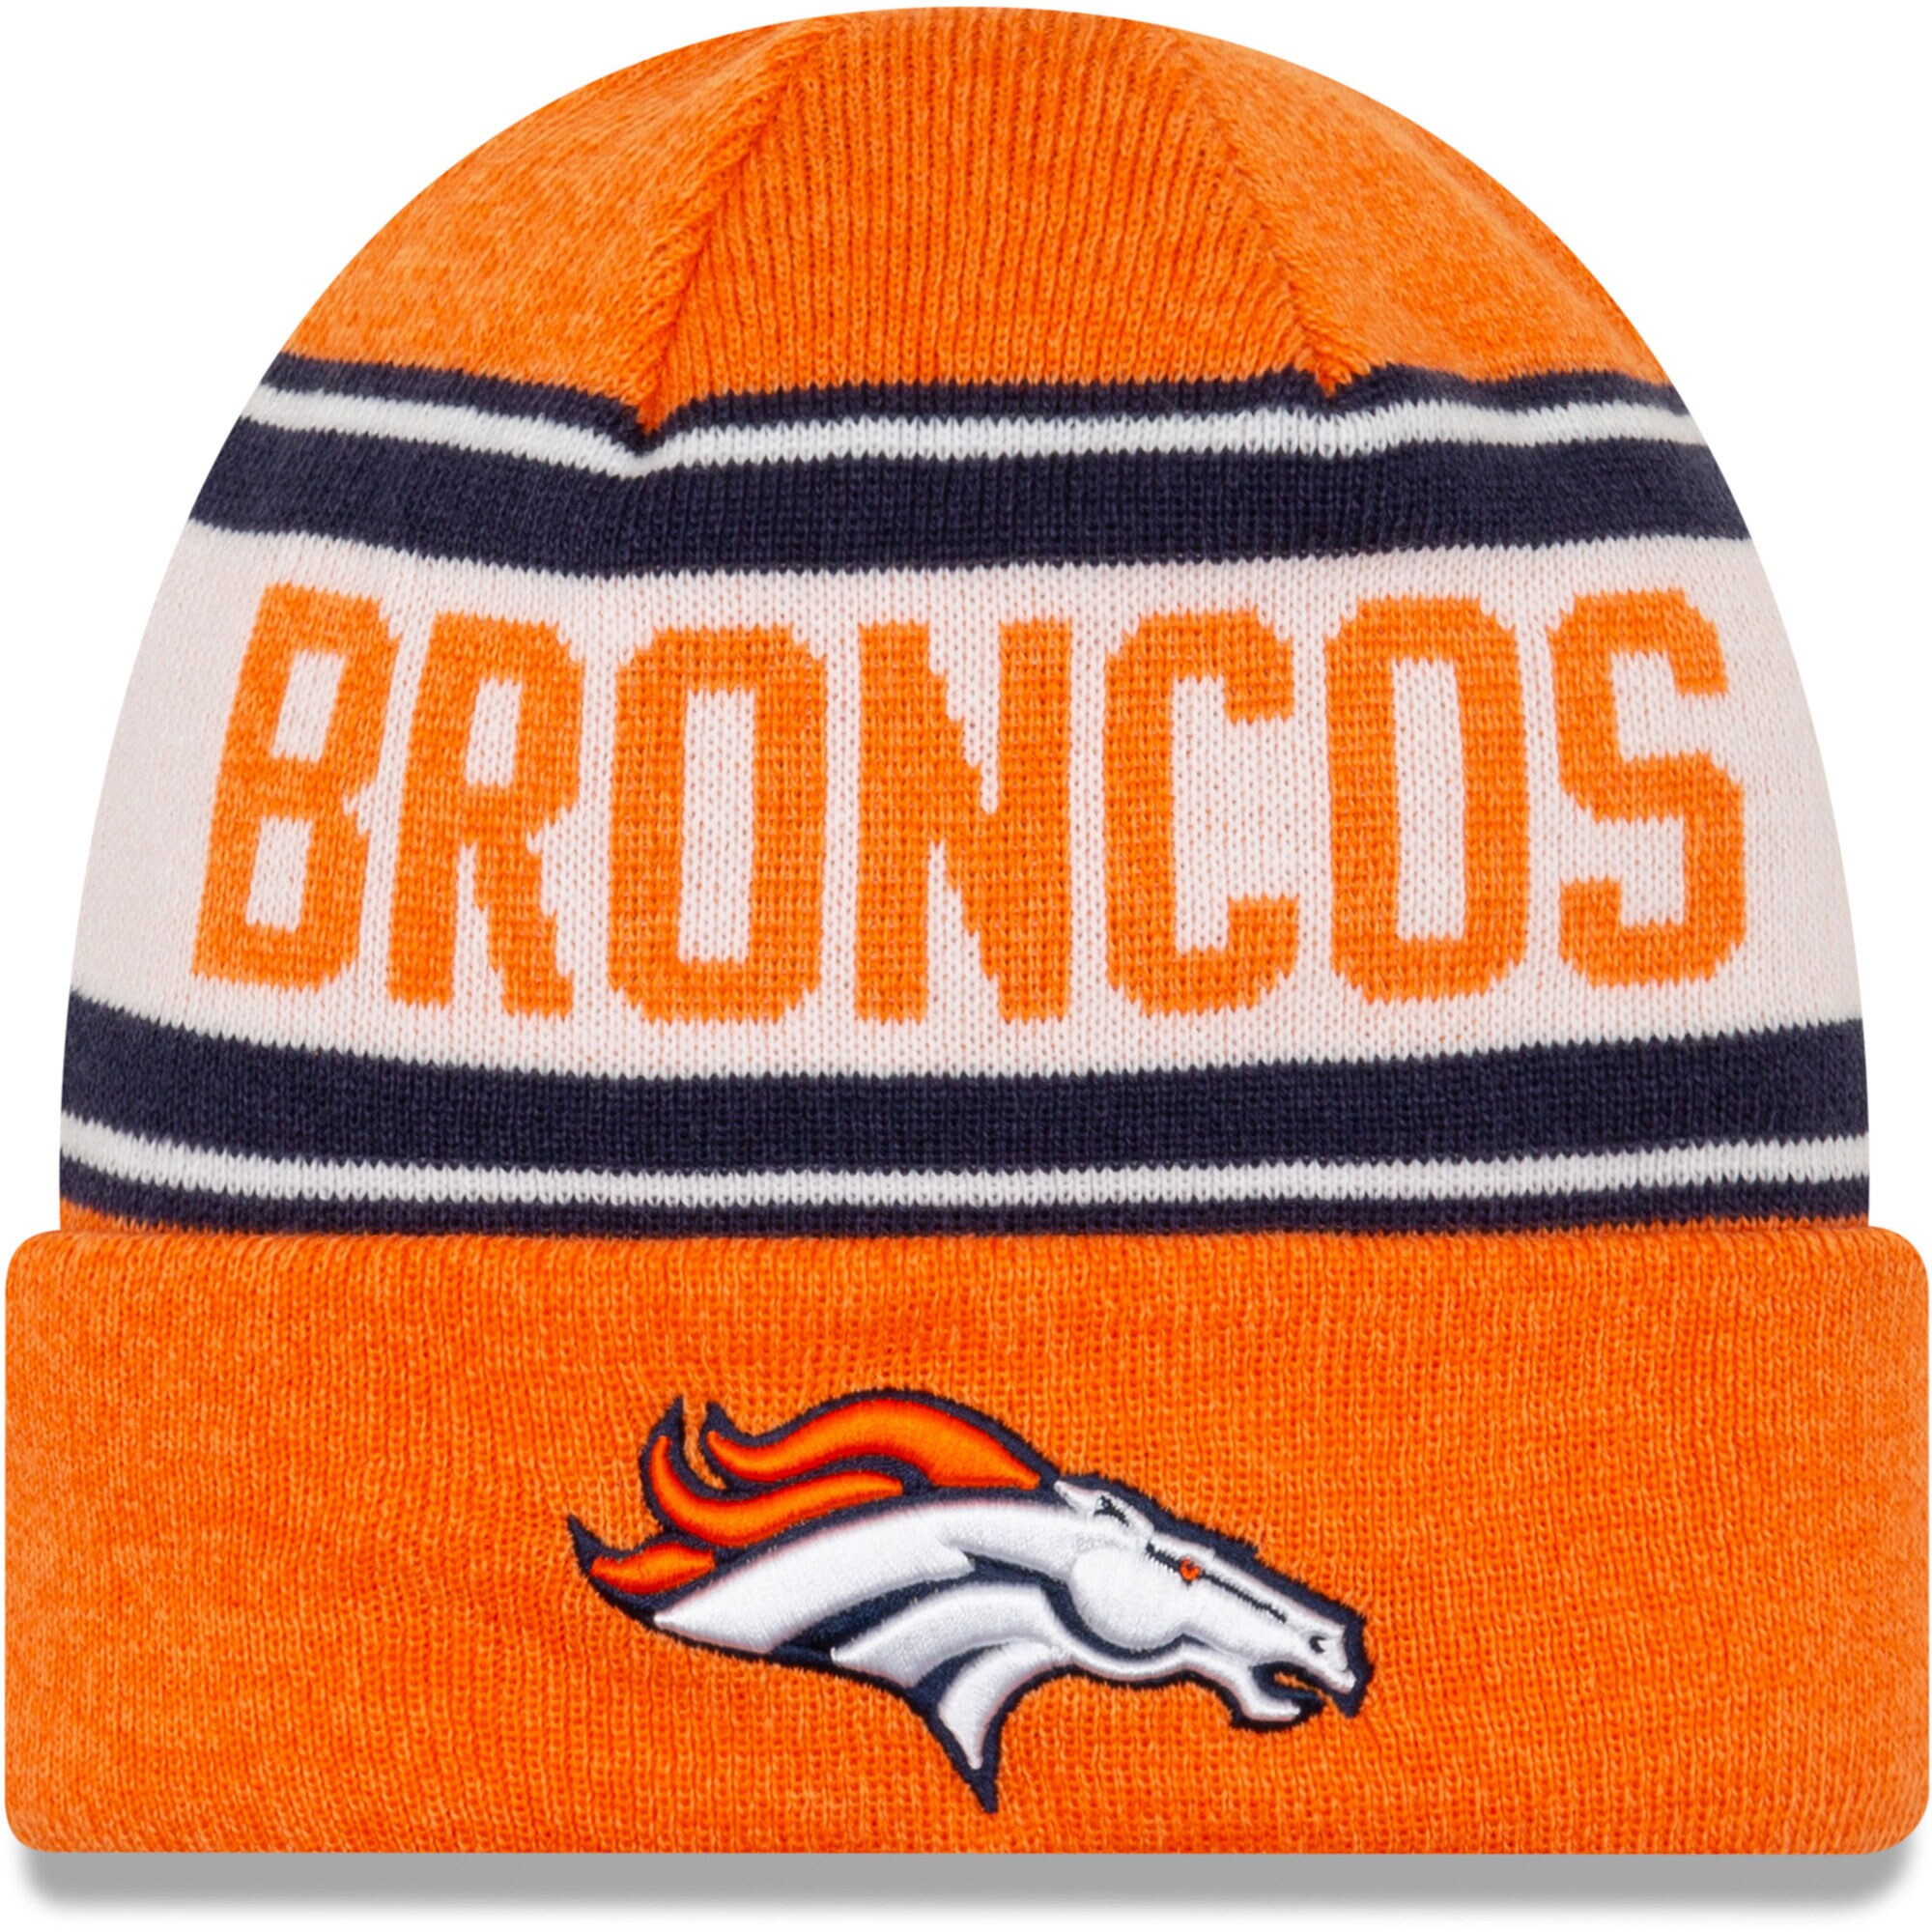 Denver Broncos New Era Knit Stated Cuffed Knit Hat - Orange